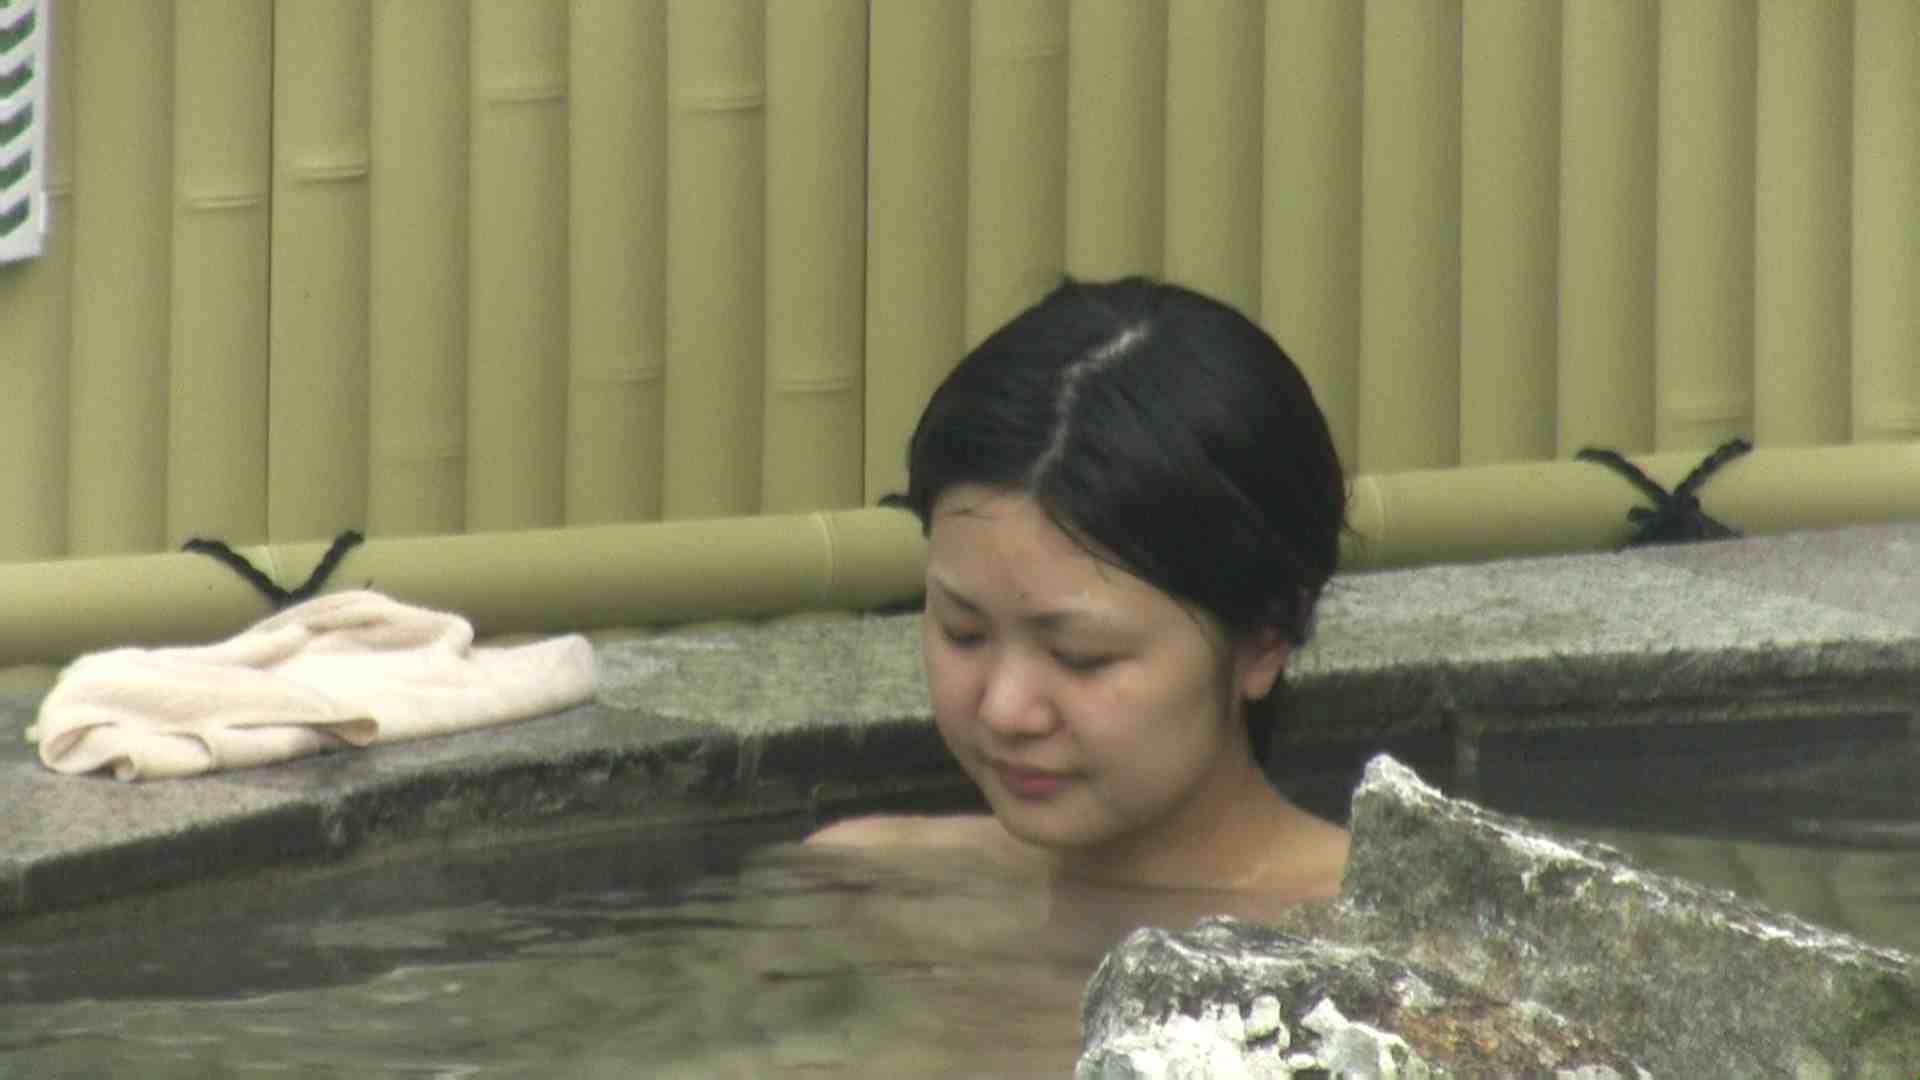 高画質露天女風呂観察 vol.032 乙女 えろ無修正画像 83pic 39